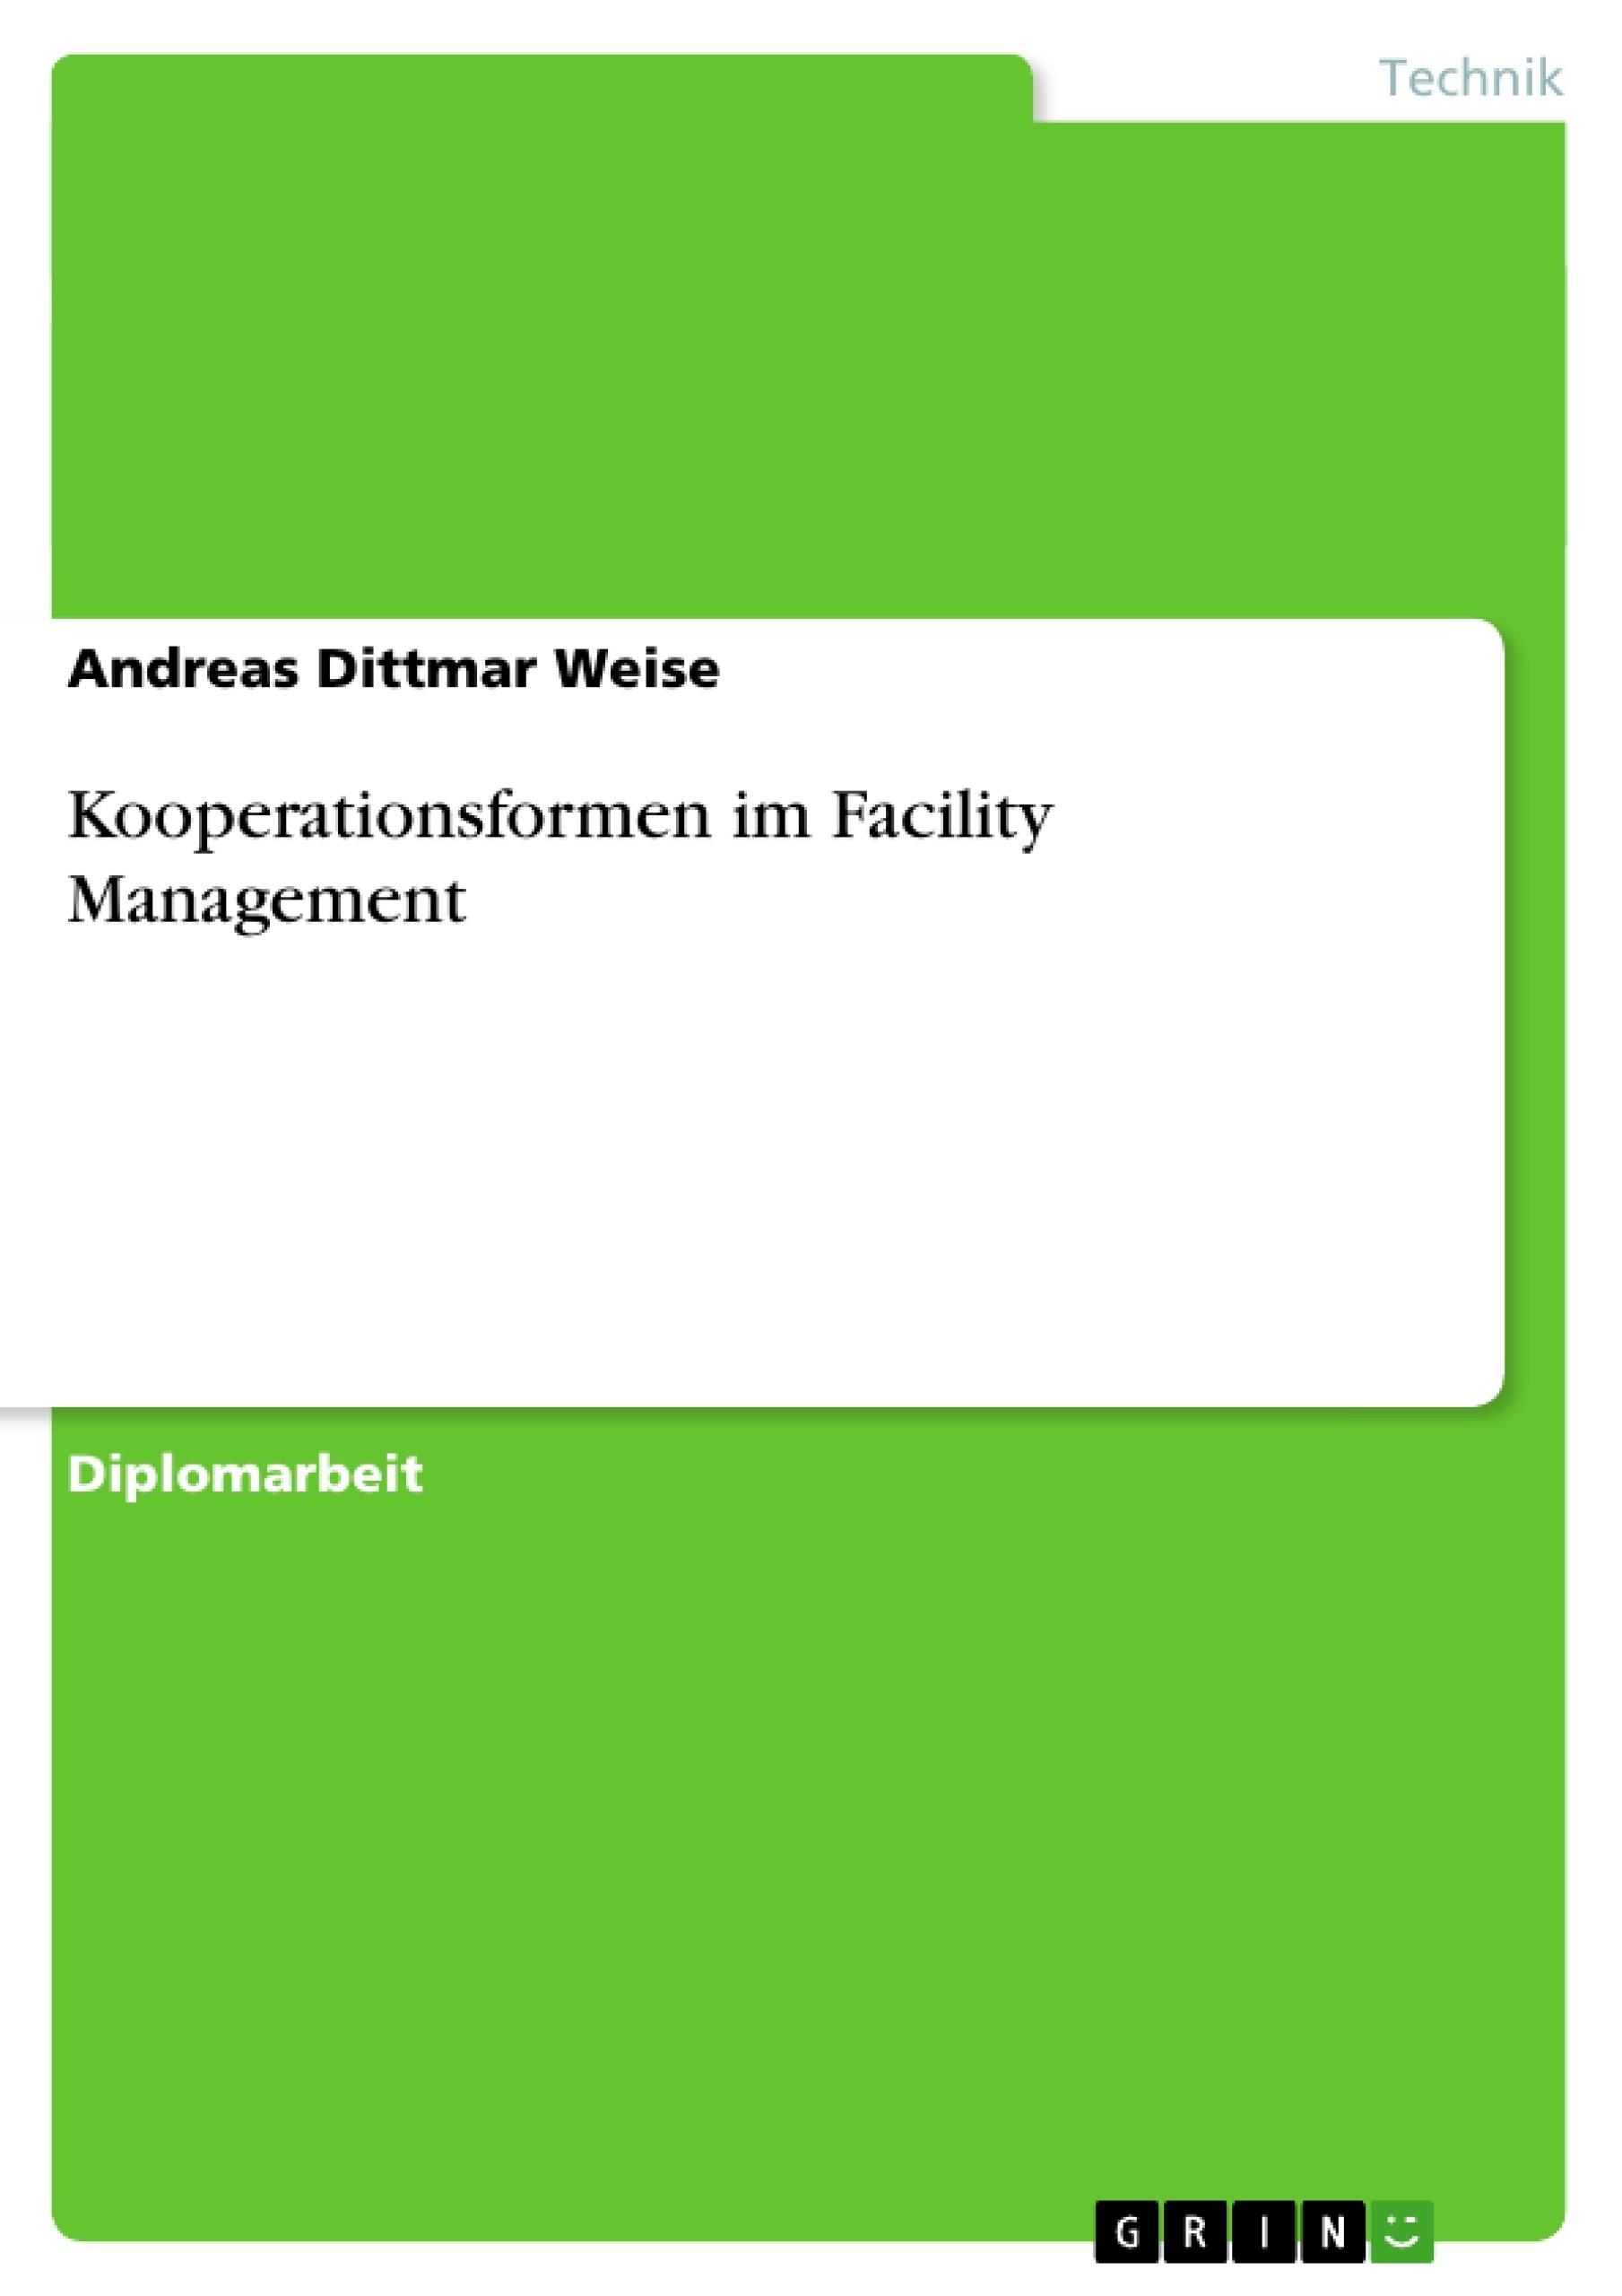 Titel: Kooperationsformen im Facility Management